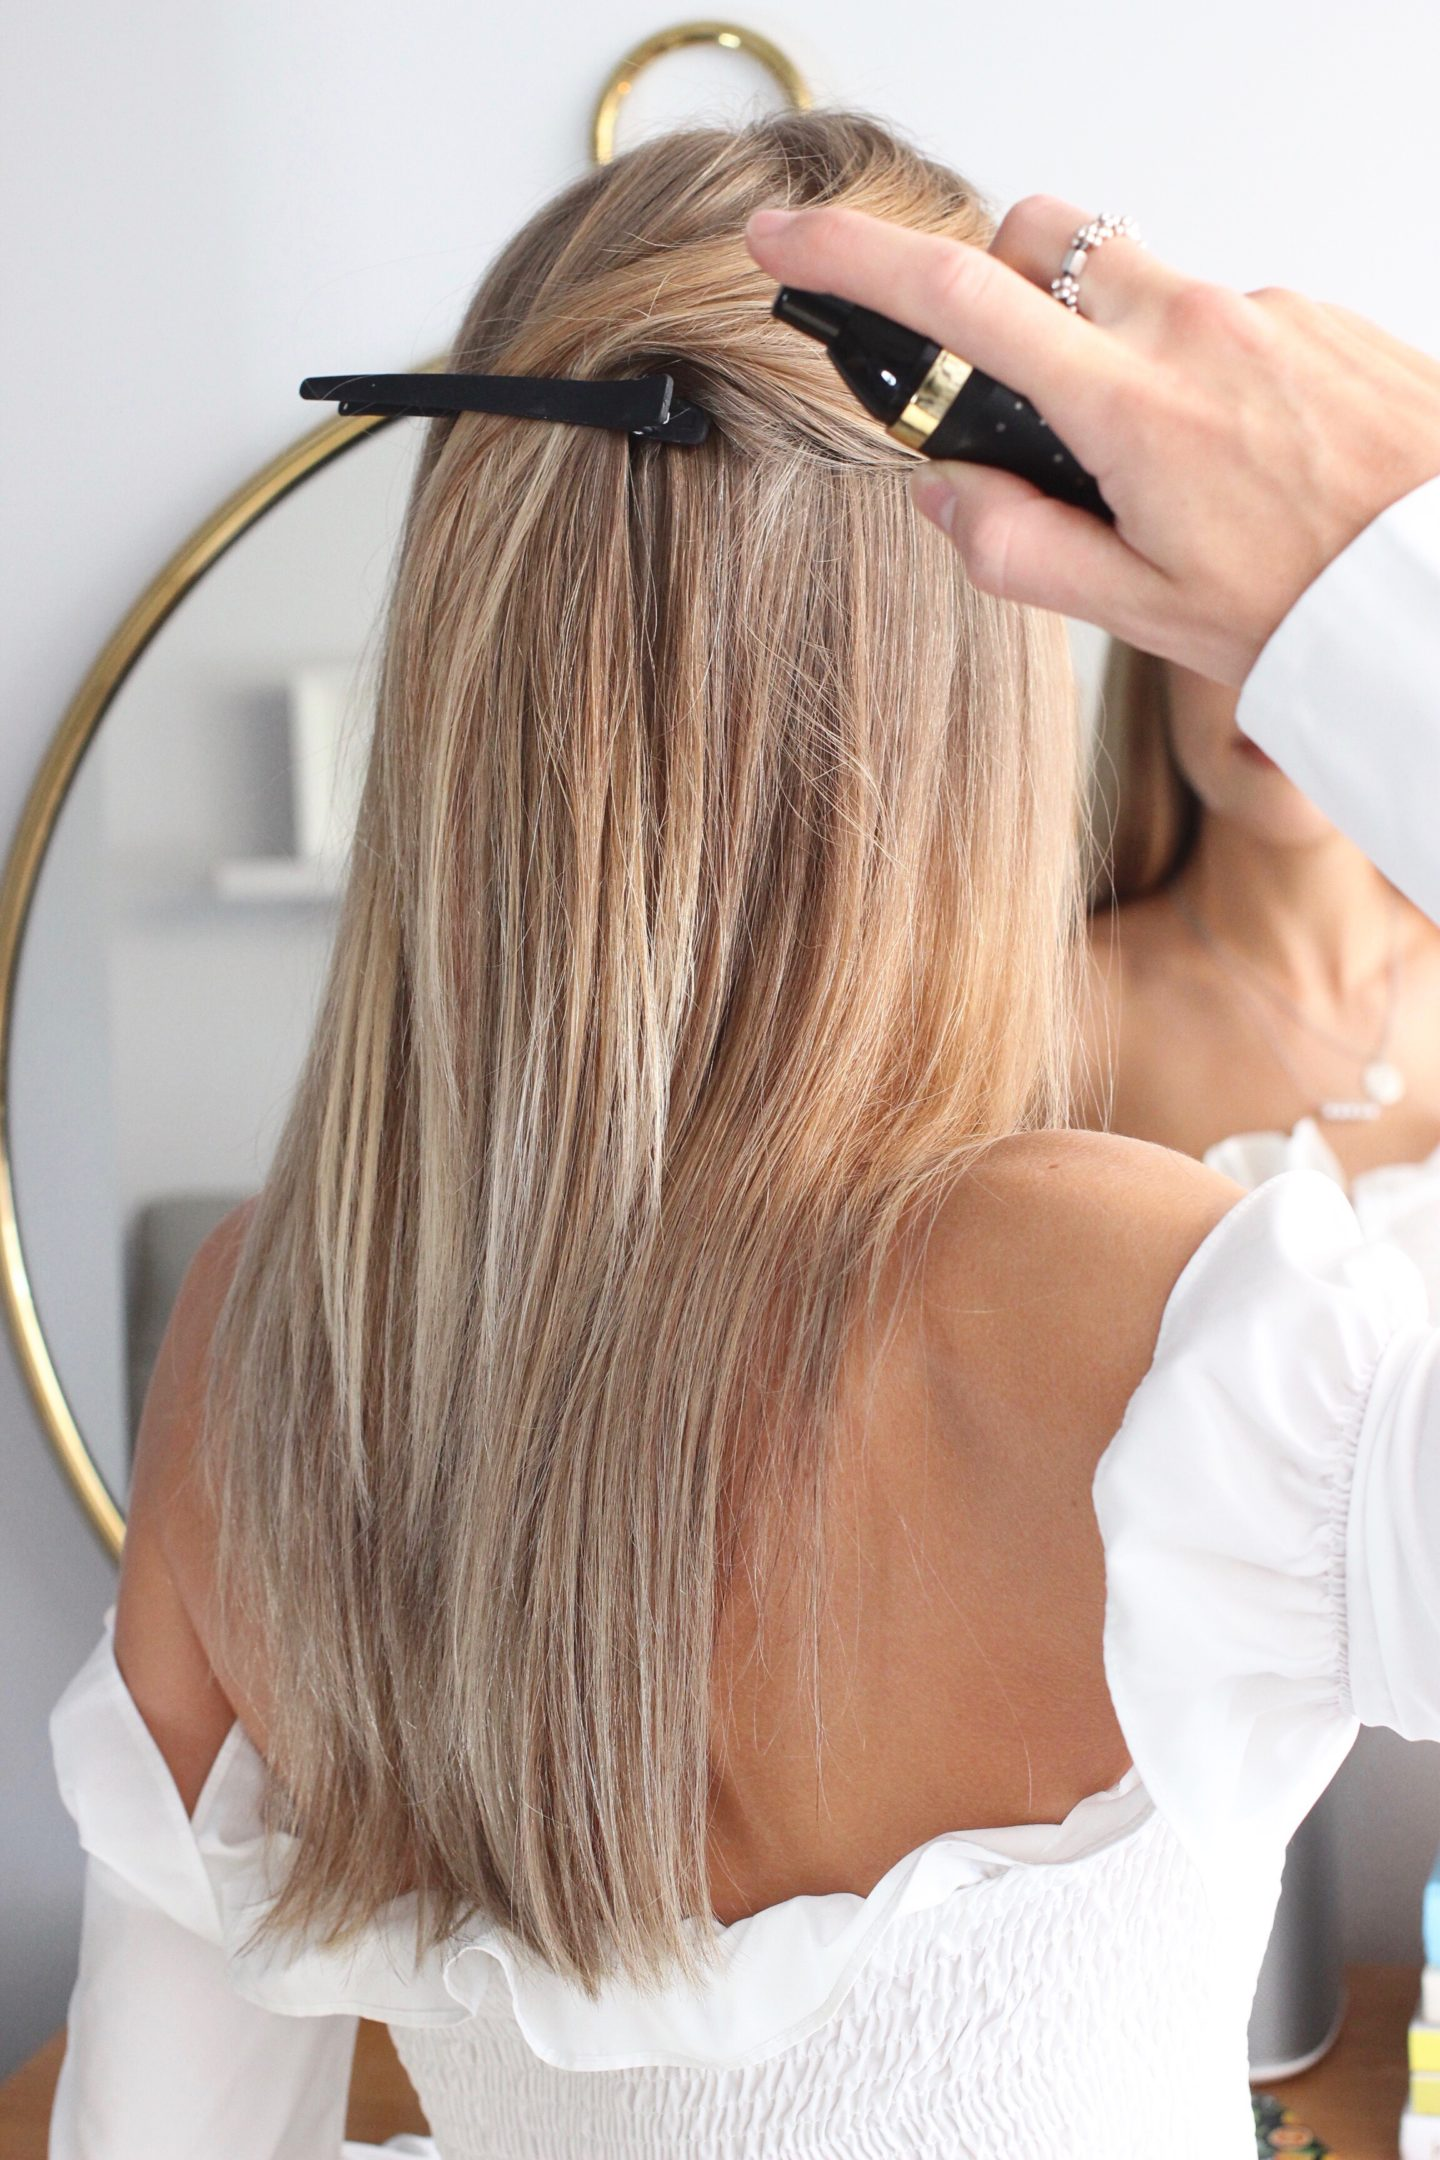 bronde hair on UK fashion blogger